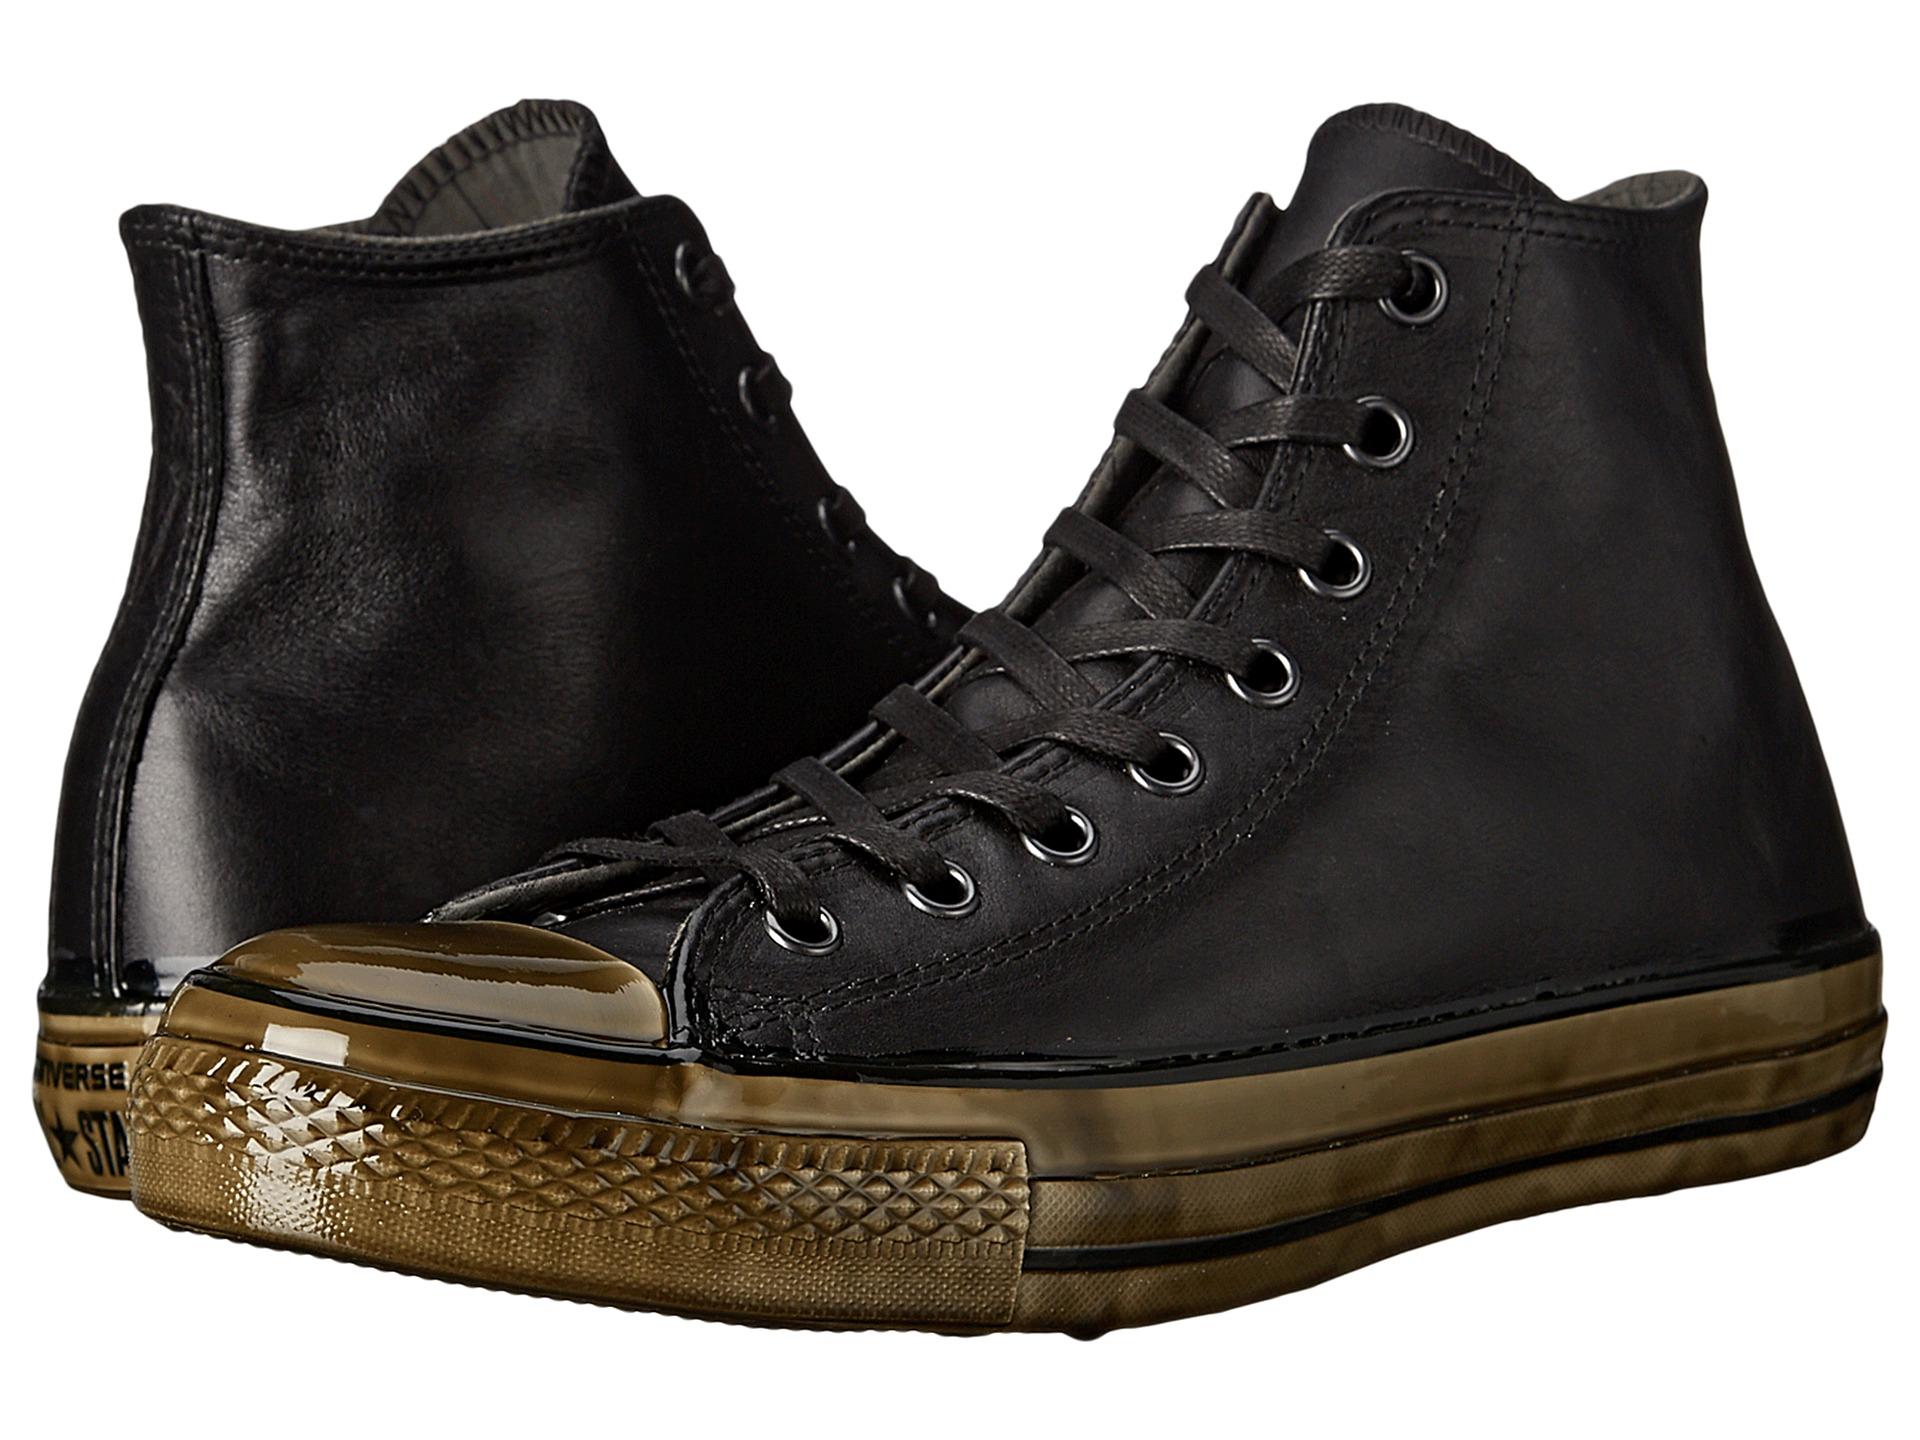 Converse by John Varvatos Chuck Taylor All Star Dipped ...